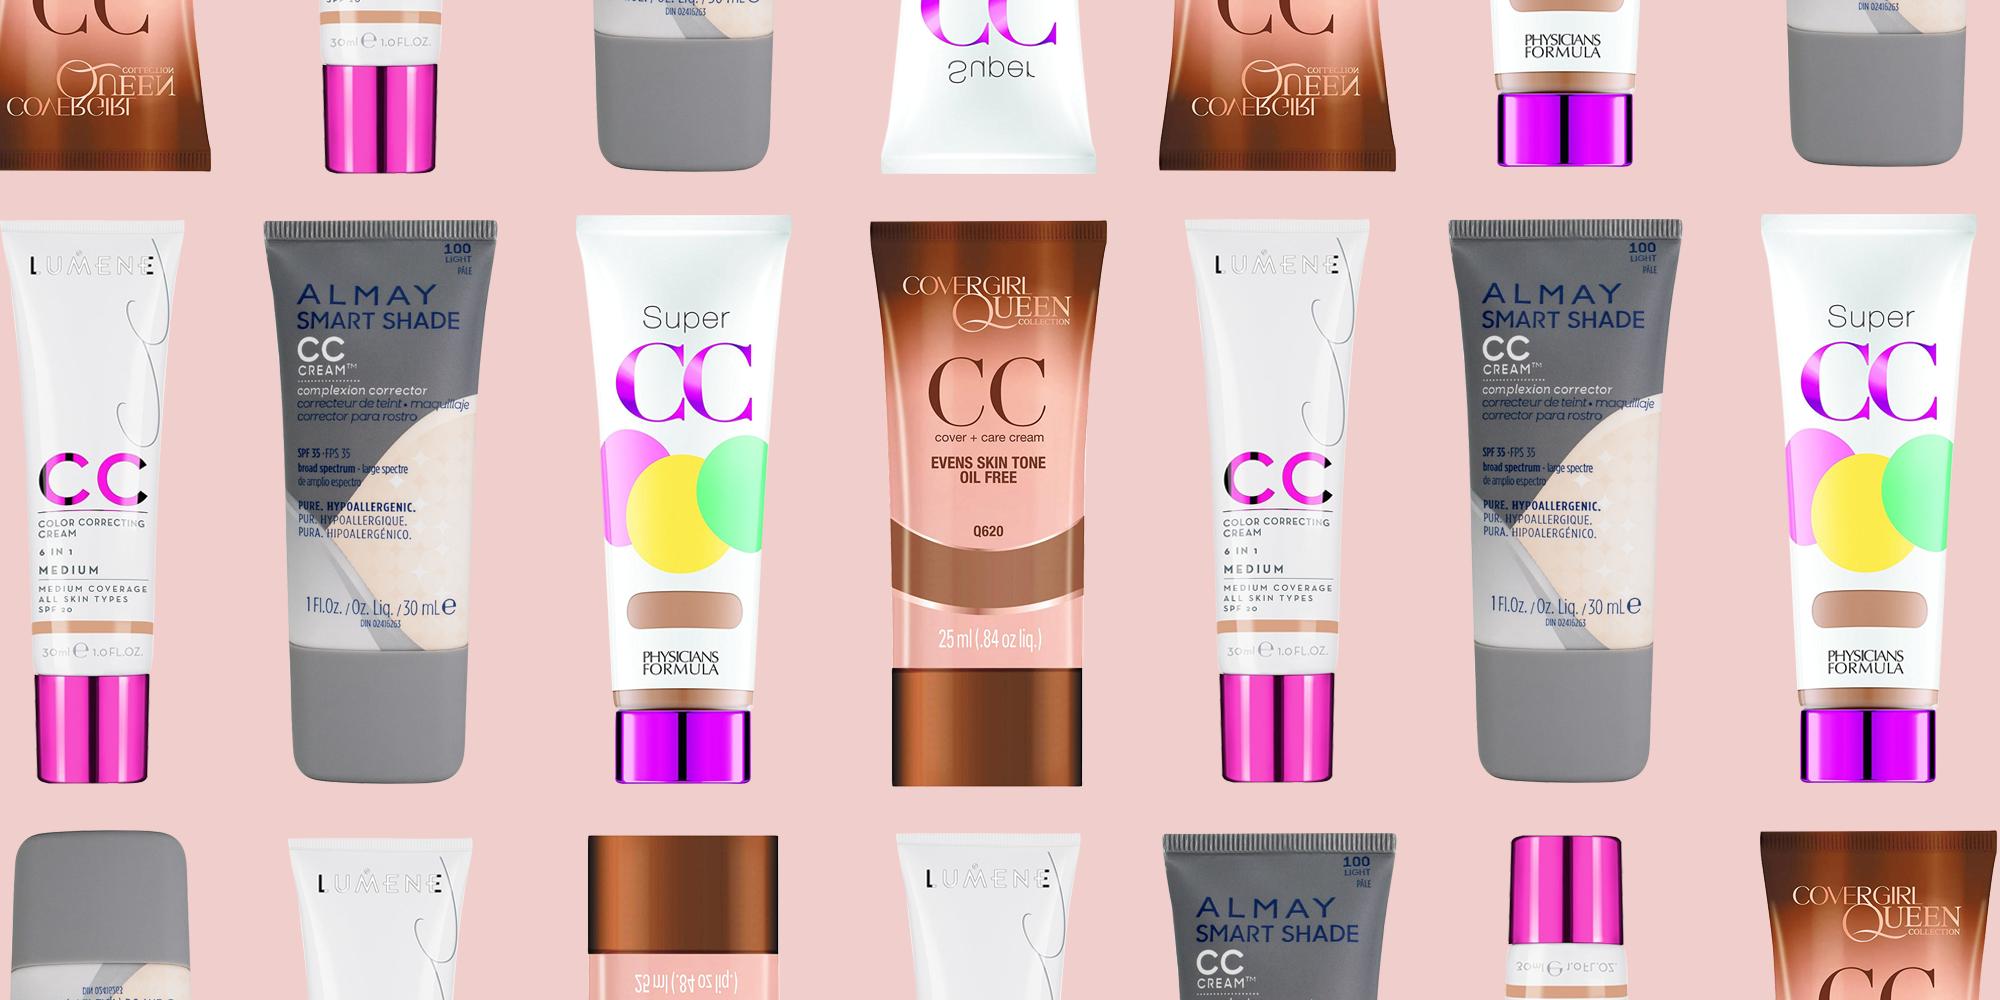 8 Best Drugstore Cc Creams Budget Friendly Color Correcting Cream